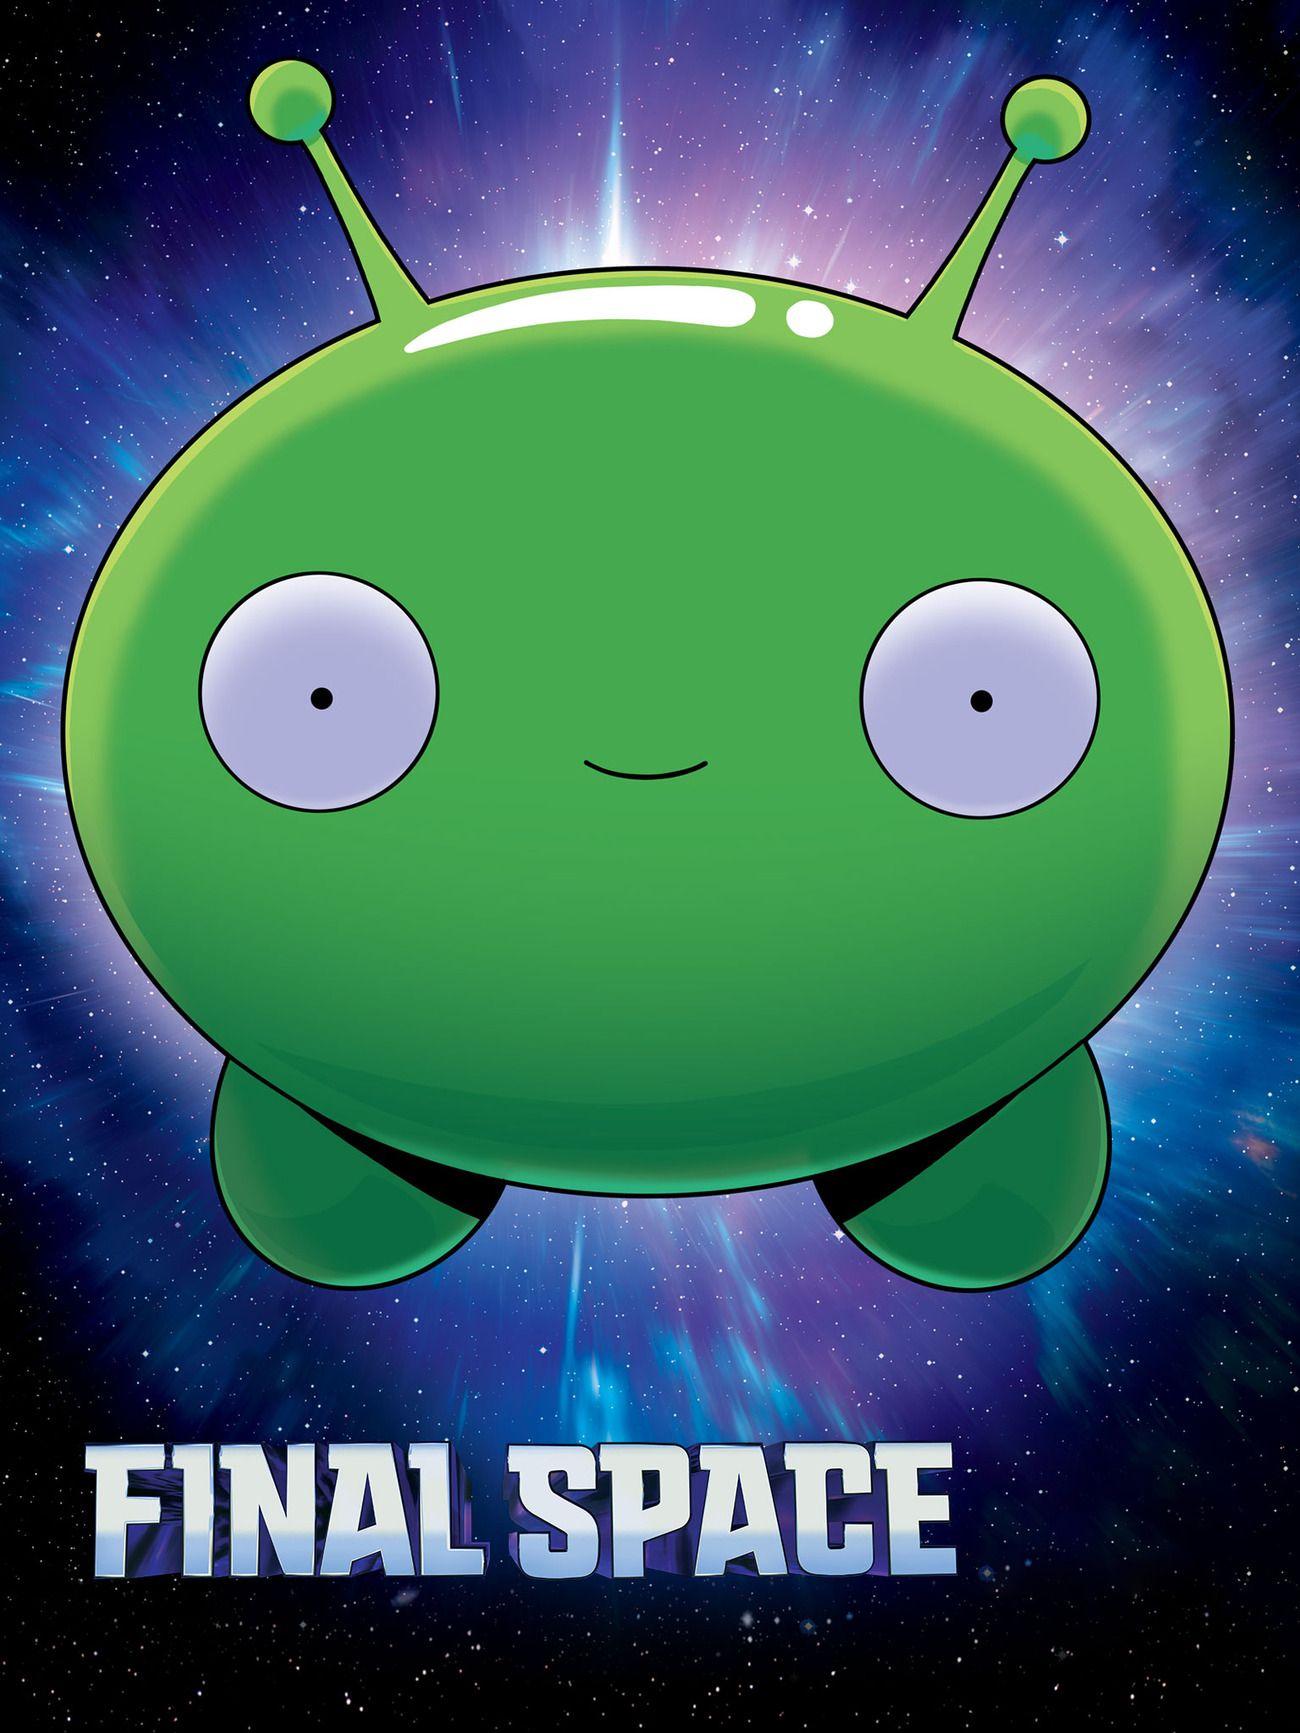 Final Space—Mooncake (tattoo idea!) Animes online